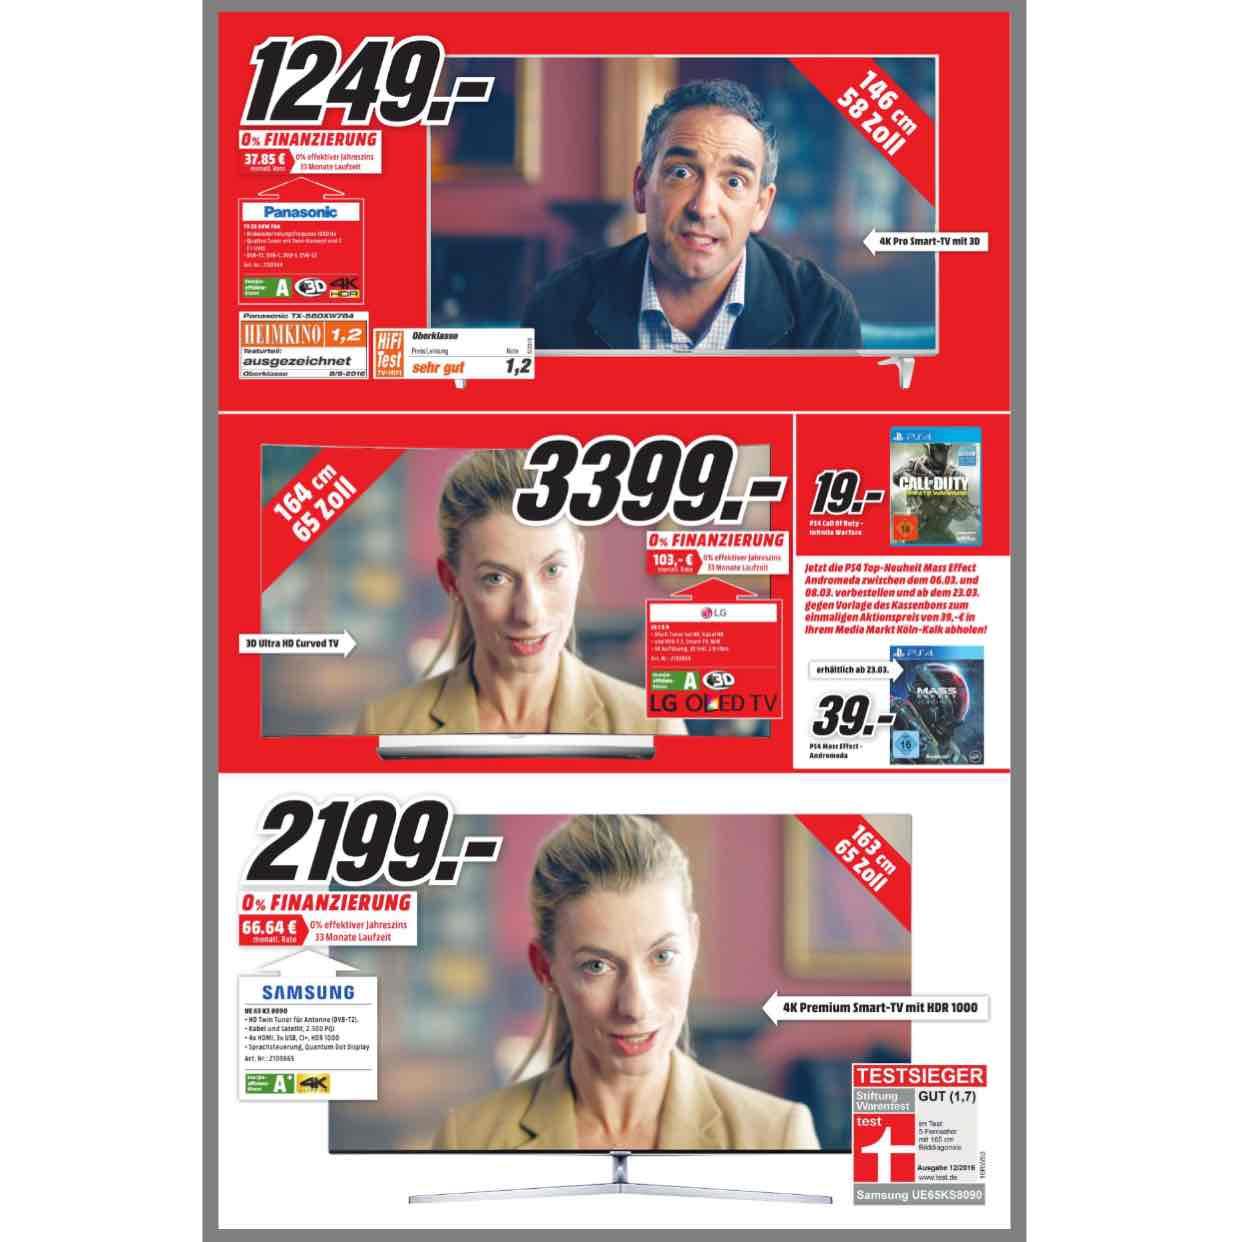 [lokal MM Köln Kalk] Panasonic TX 58 DXW 784 für 1.249,-, LG 65 C 6 D für 3.399,-, Samsung UE 65 KS 8090 für 2.199,-